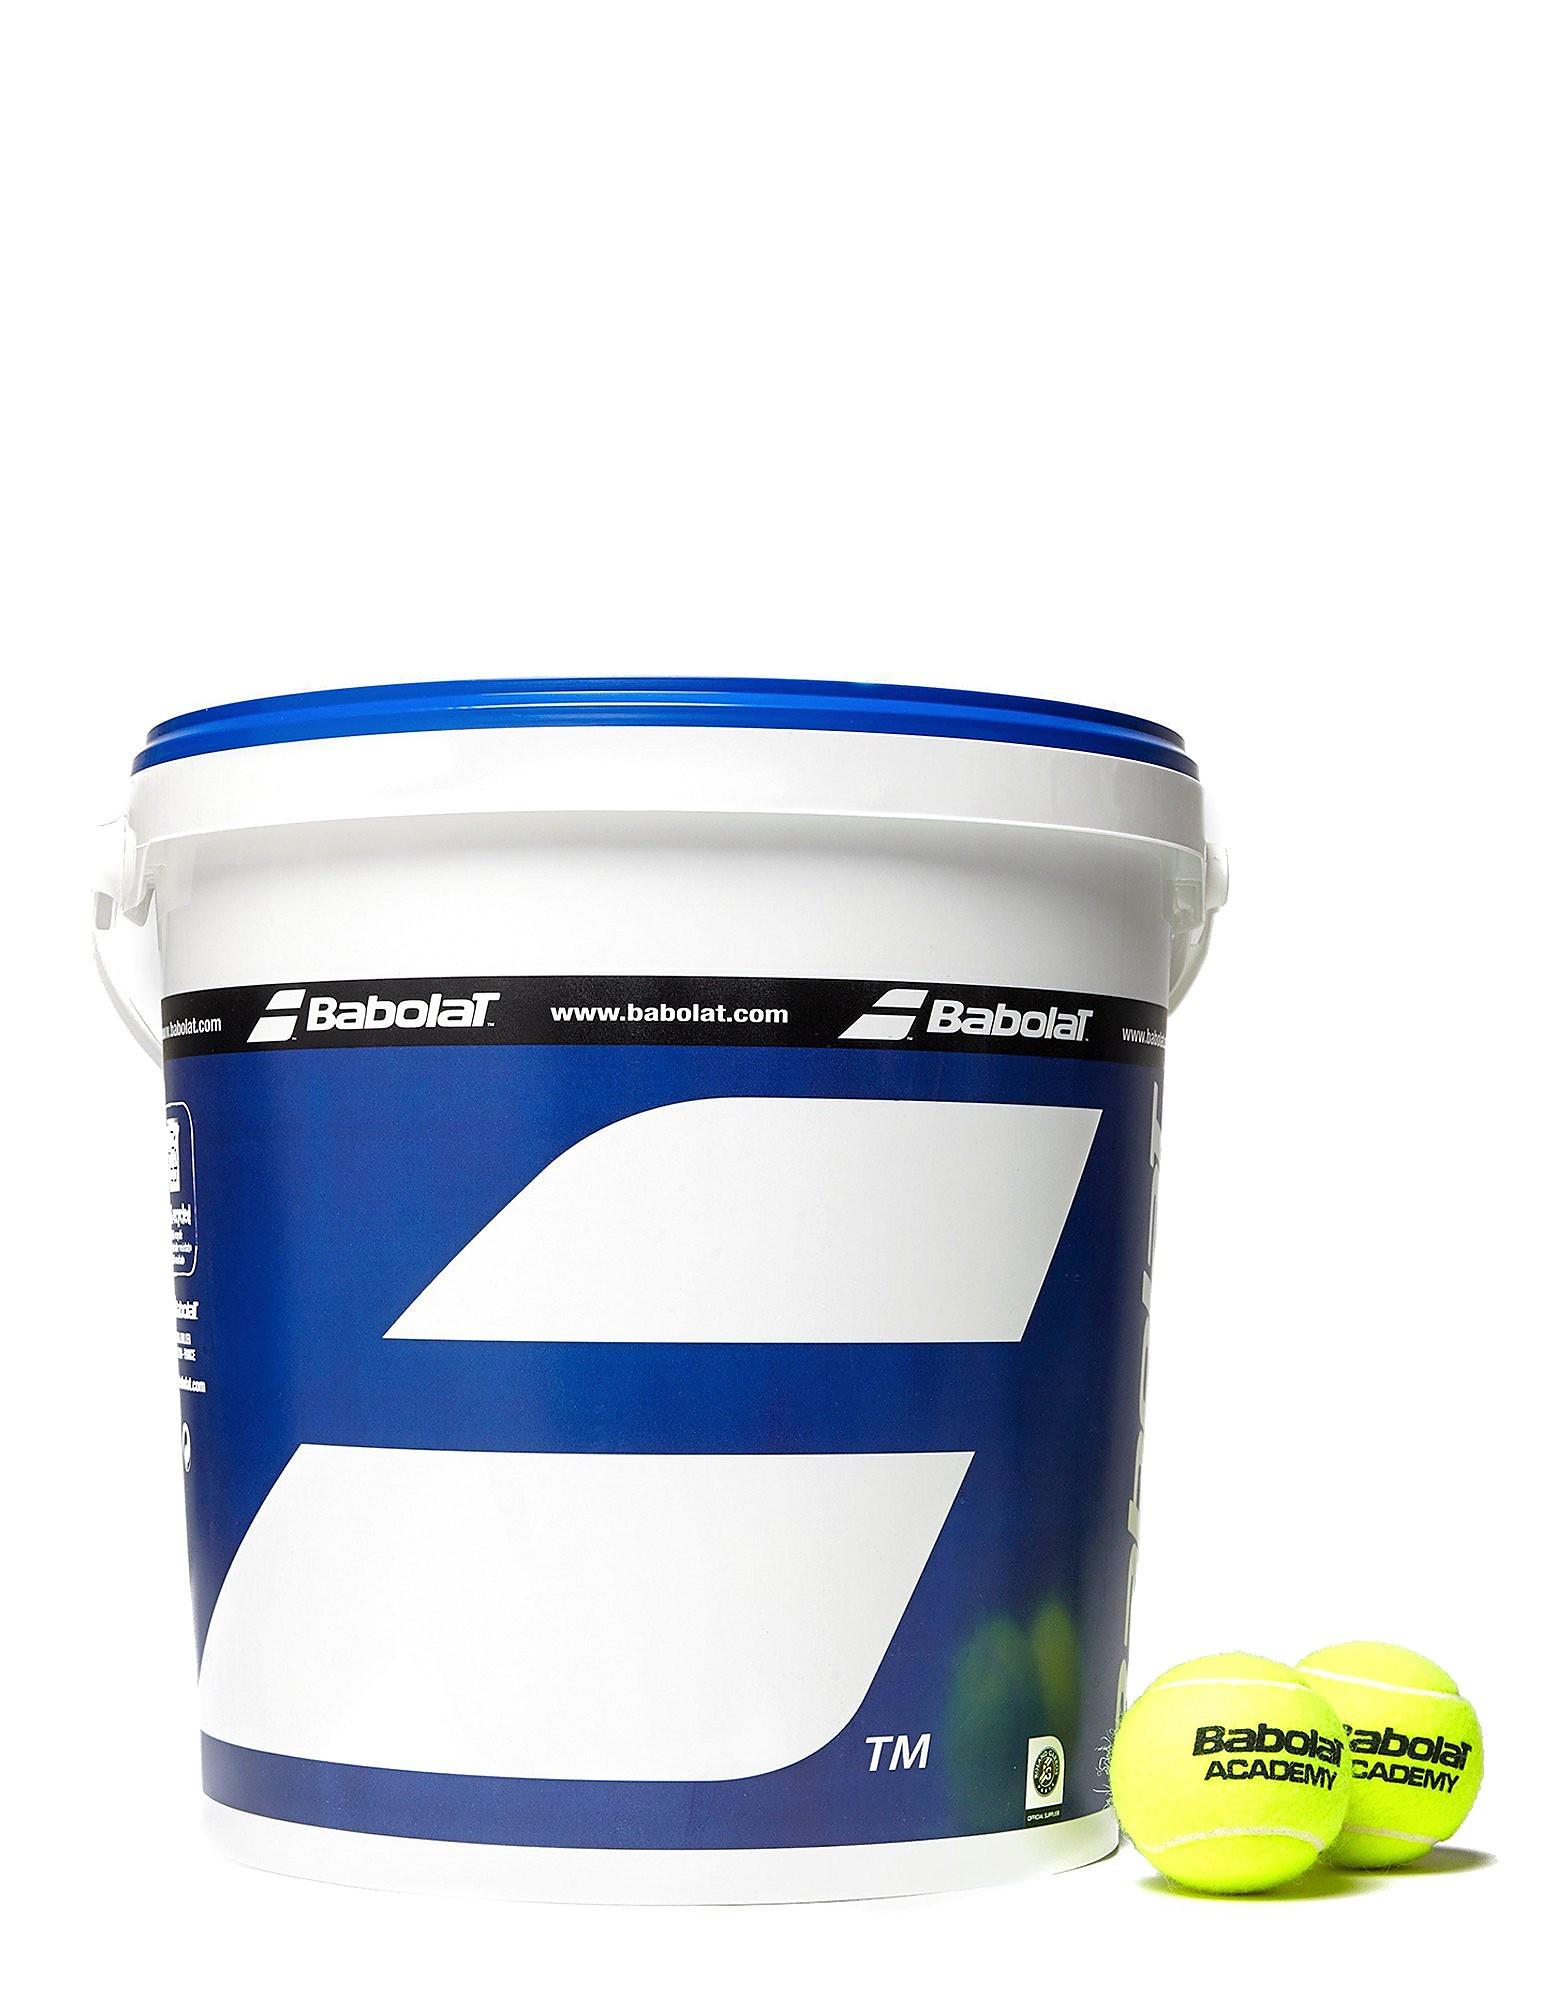 Babolat Academy Tennis Ball Box (72 balls)